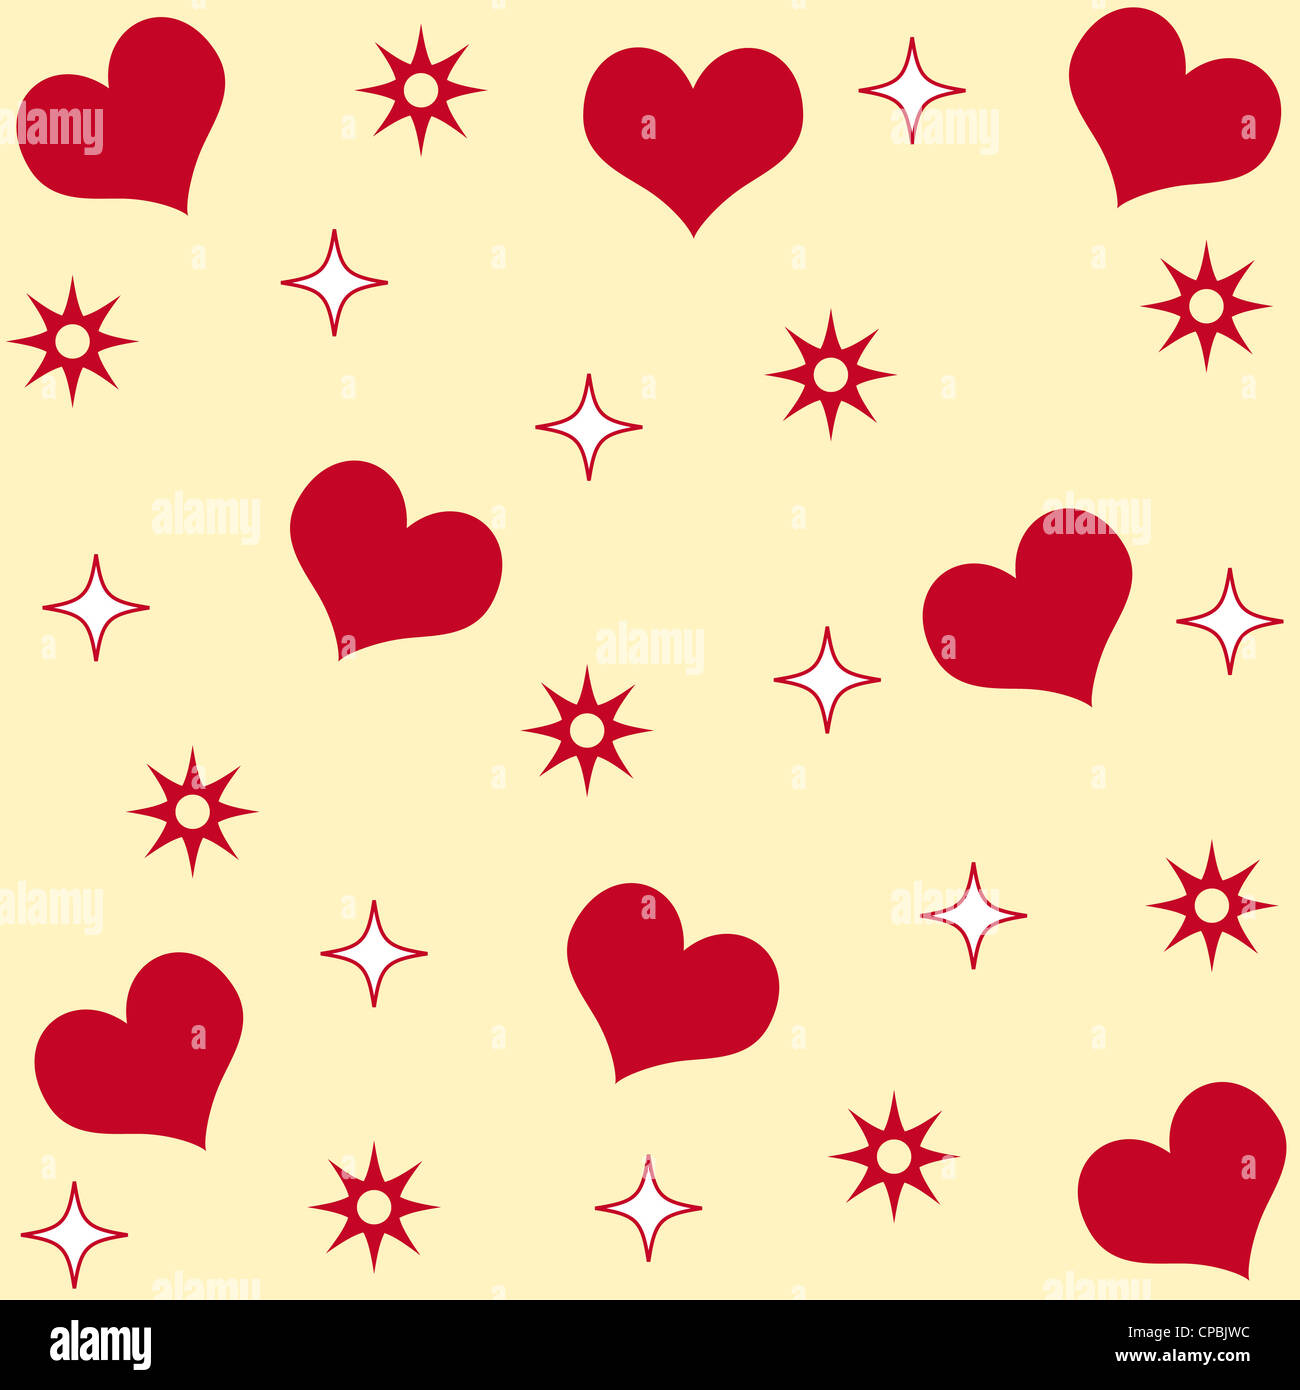 Seamless hearts and stars pattern Stock Photo